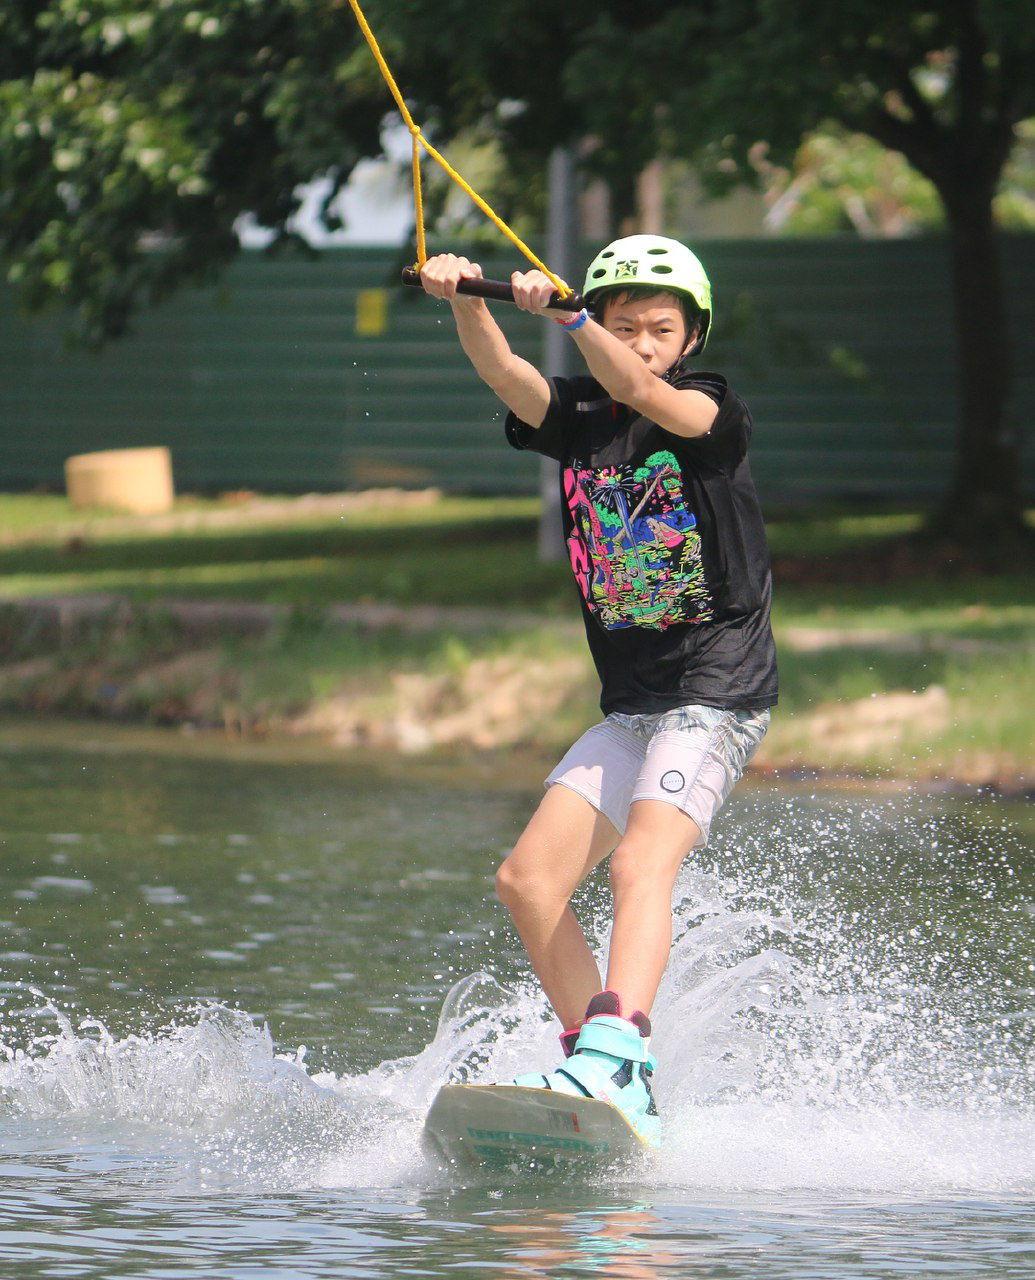 singapore wake park kid wakeboard